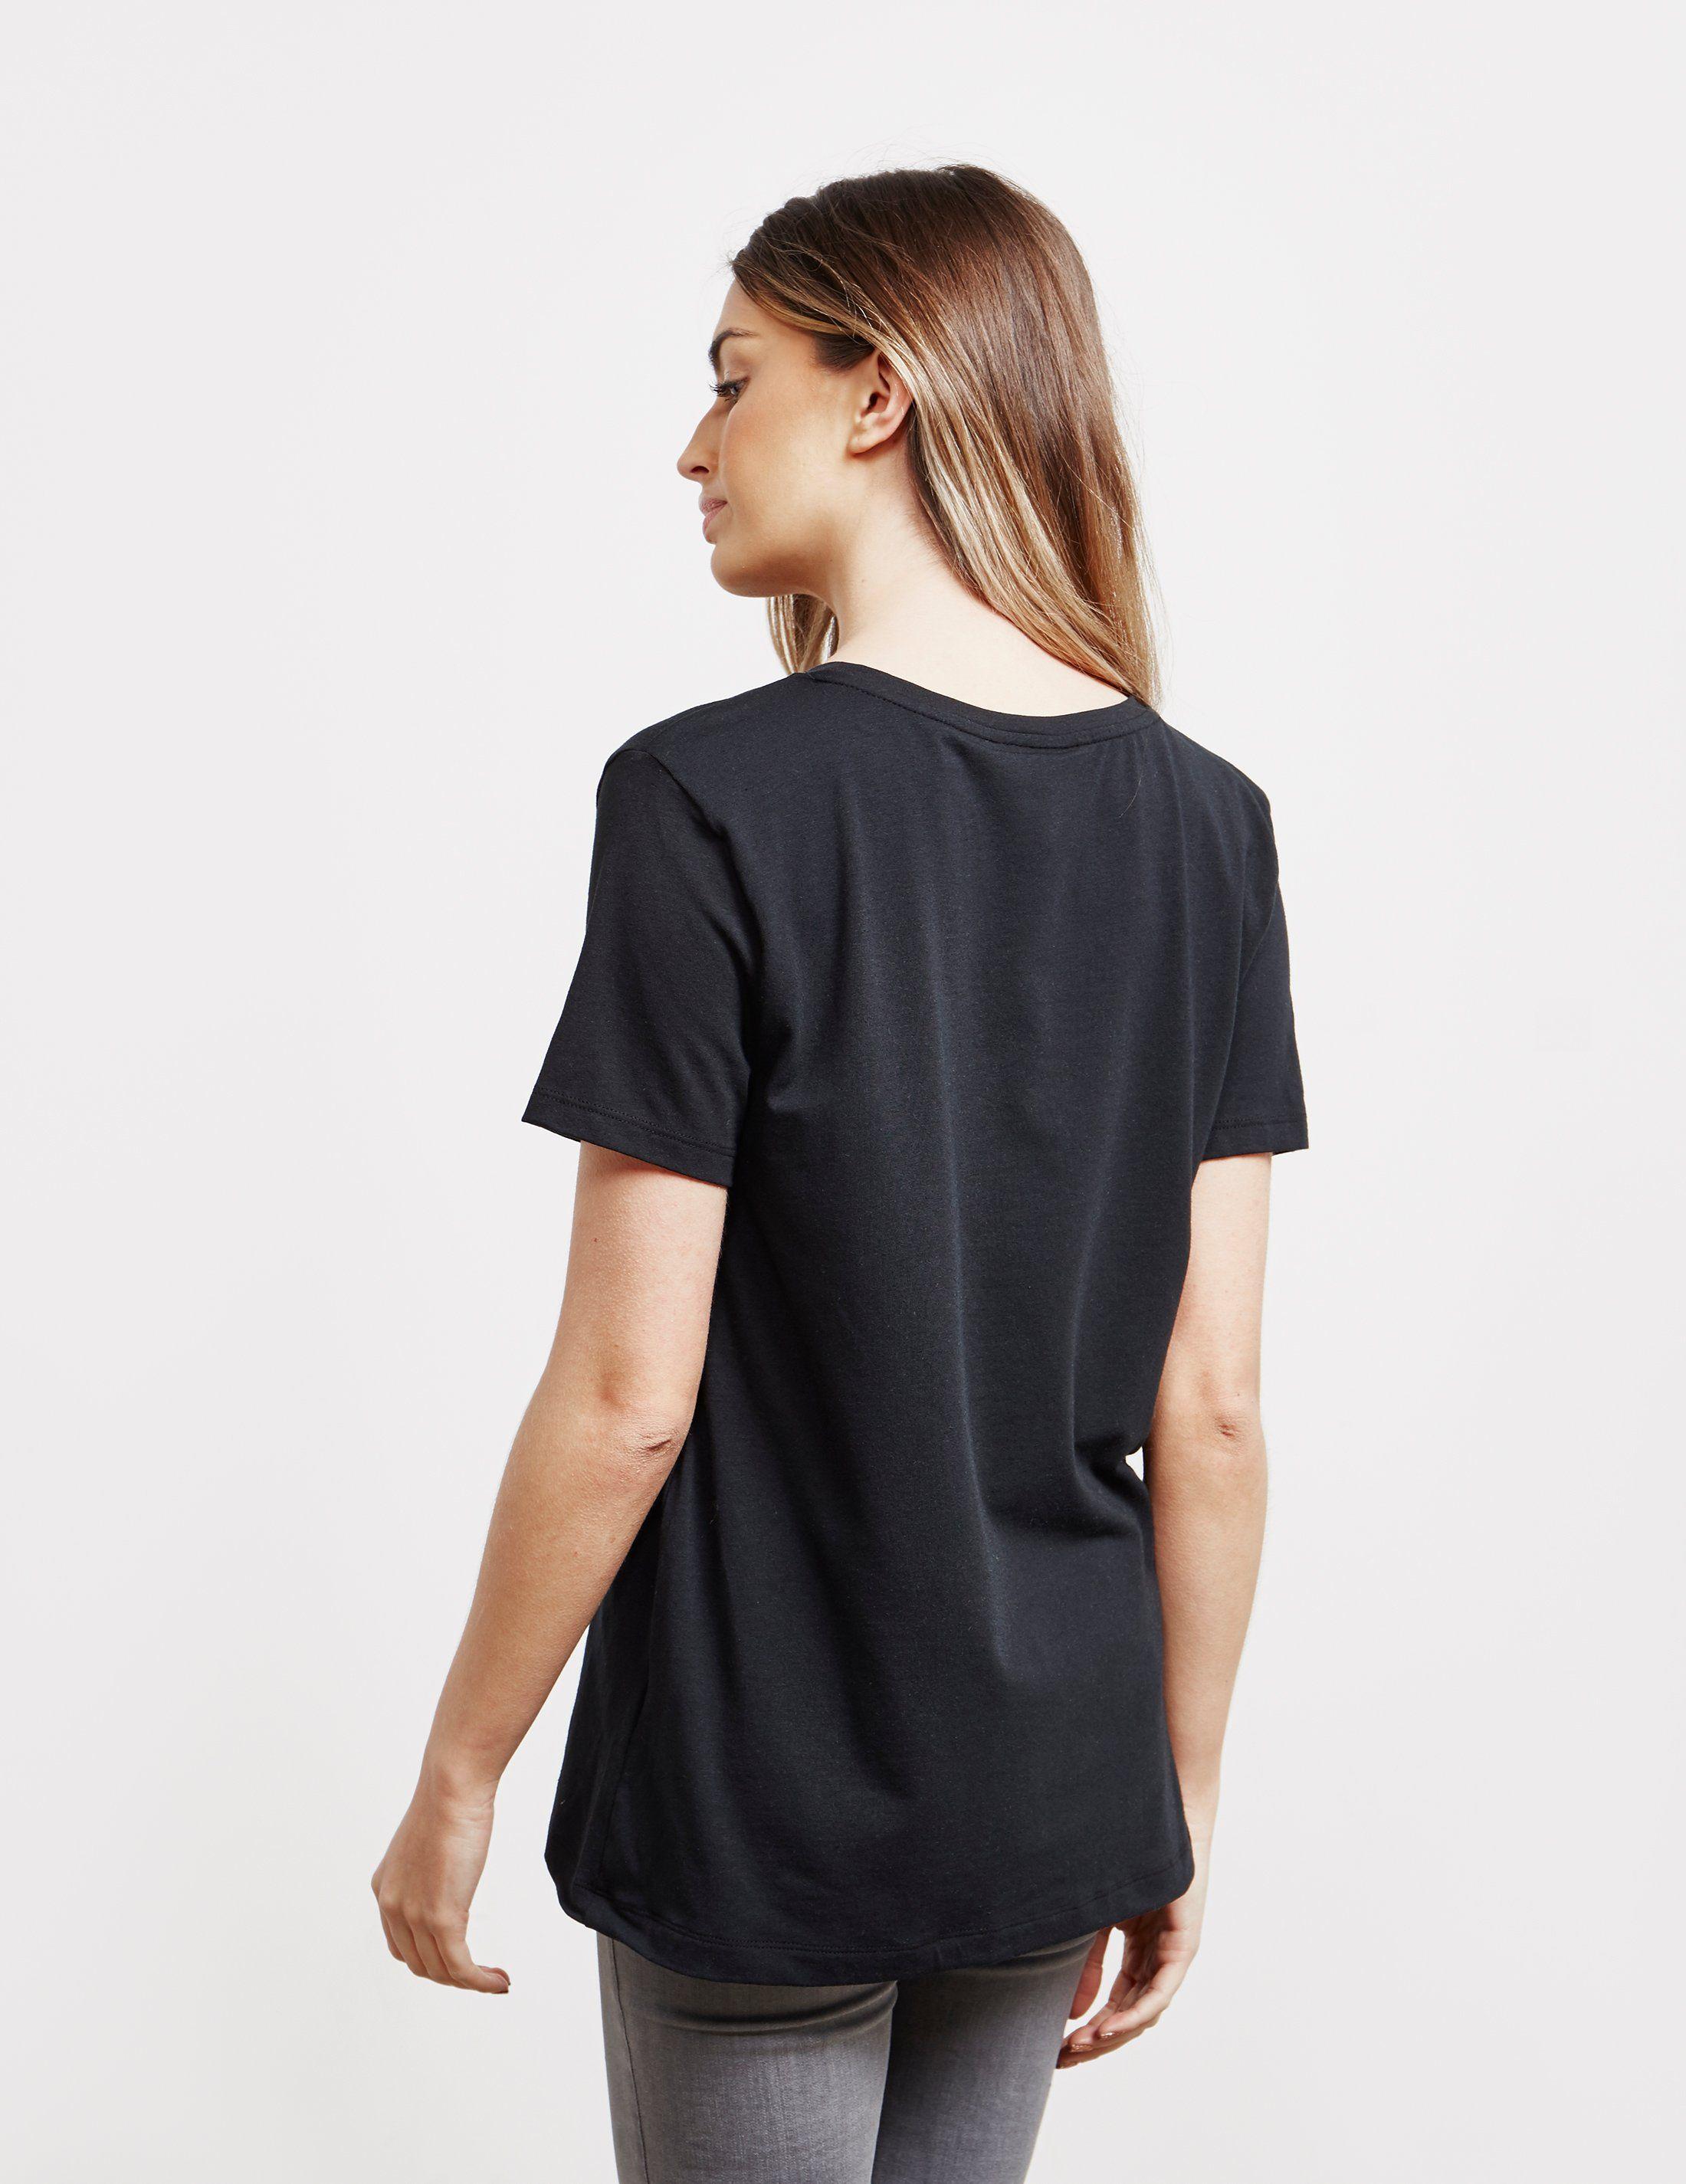 DKNY City Graphic Short Sleeve T-Shirt